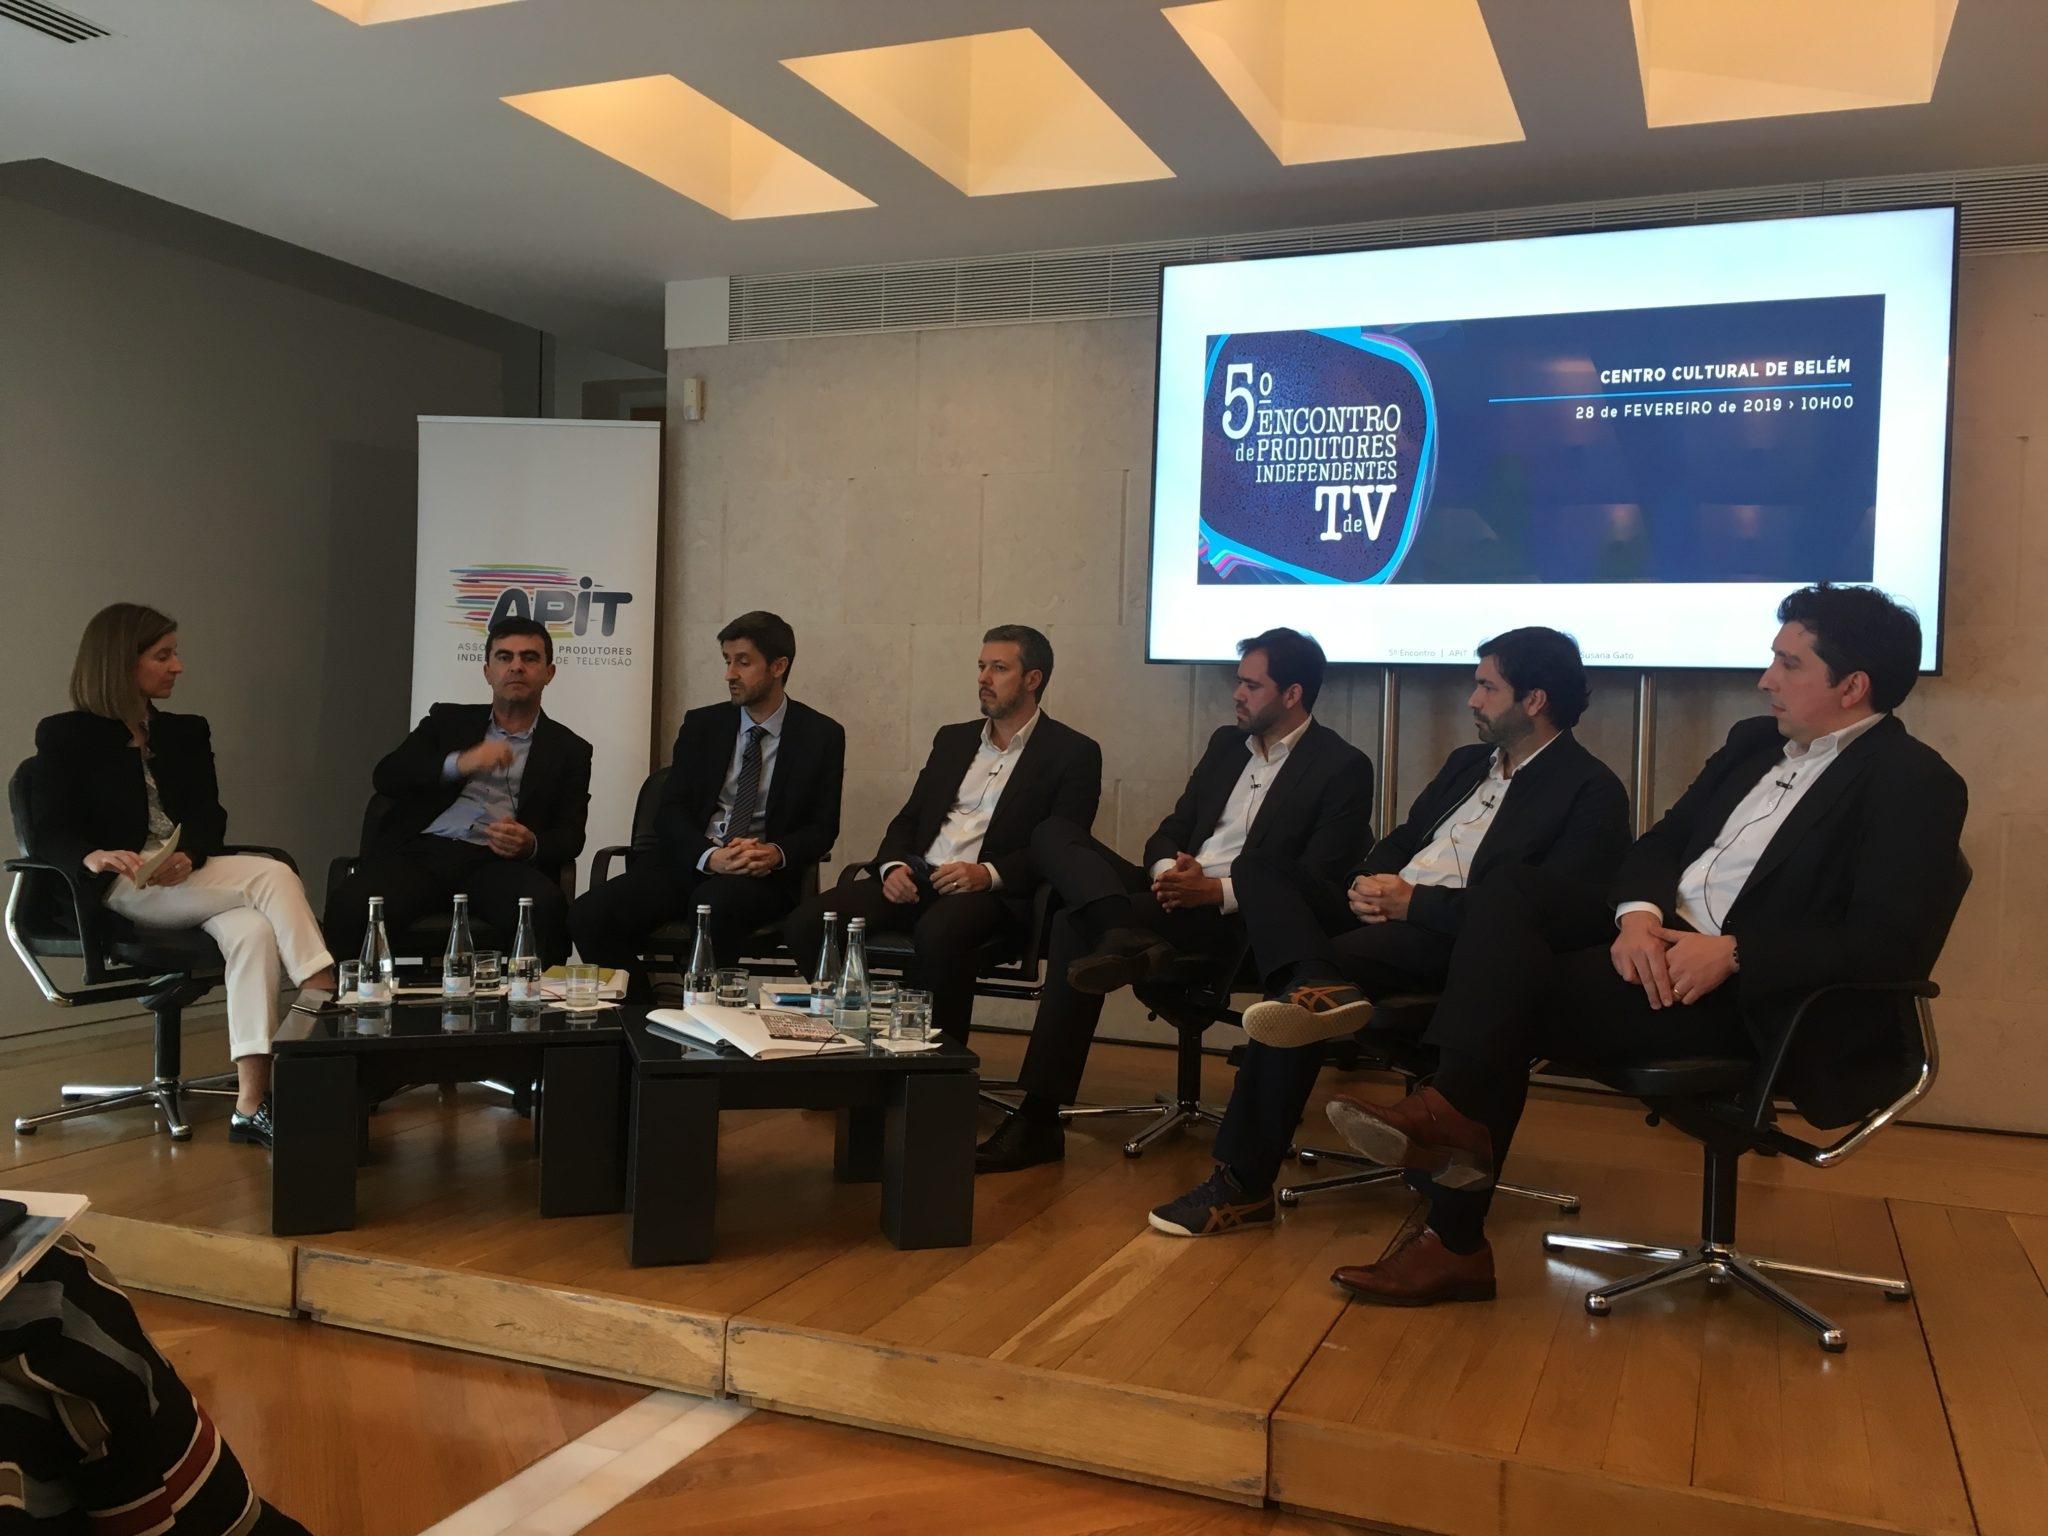 José Fragoso (RTP), Daniel Oliveira (SIC), Bruno Santos (TVI), João Diogo Ferreira (NOS), Tiago Silva Lopes (Altice) e António Margato (Vodafone)